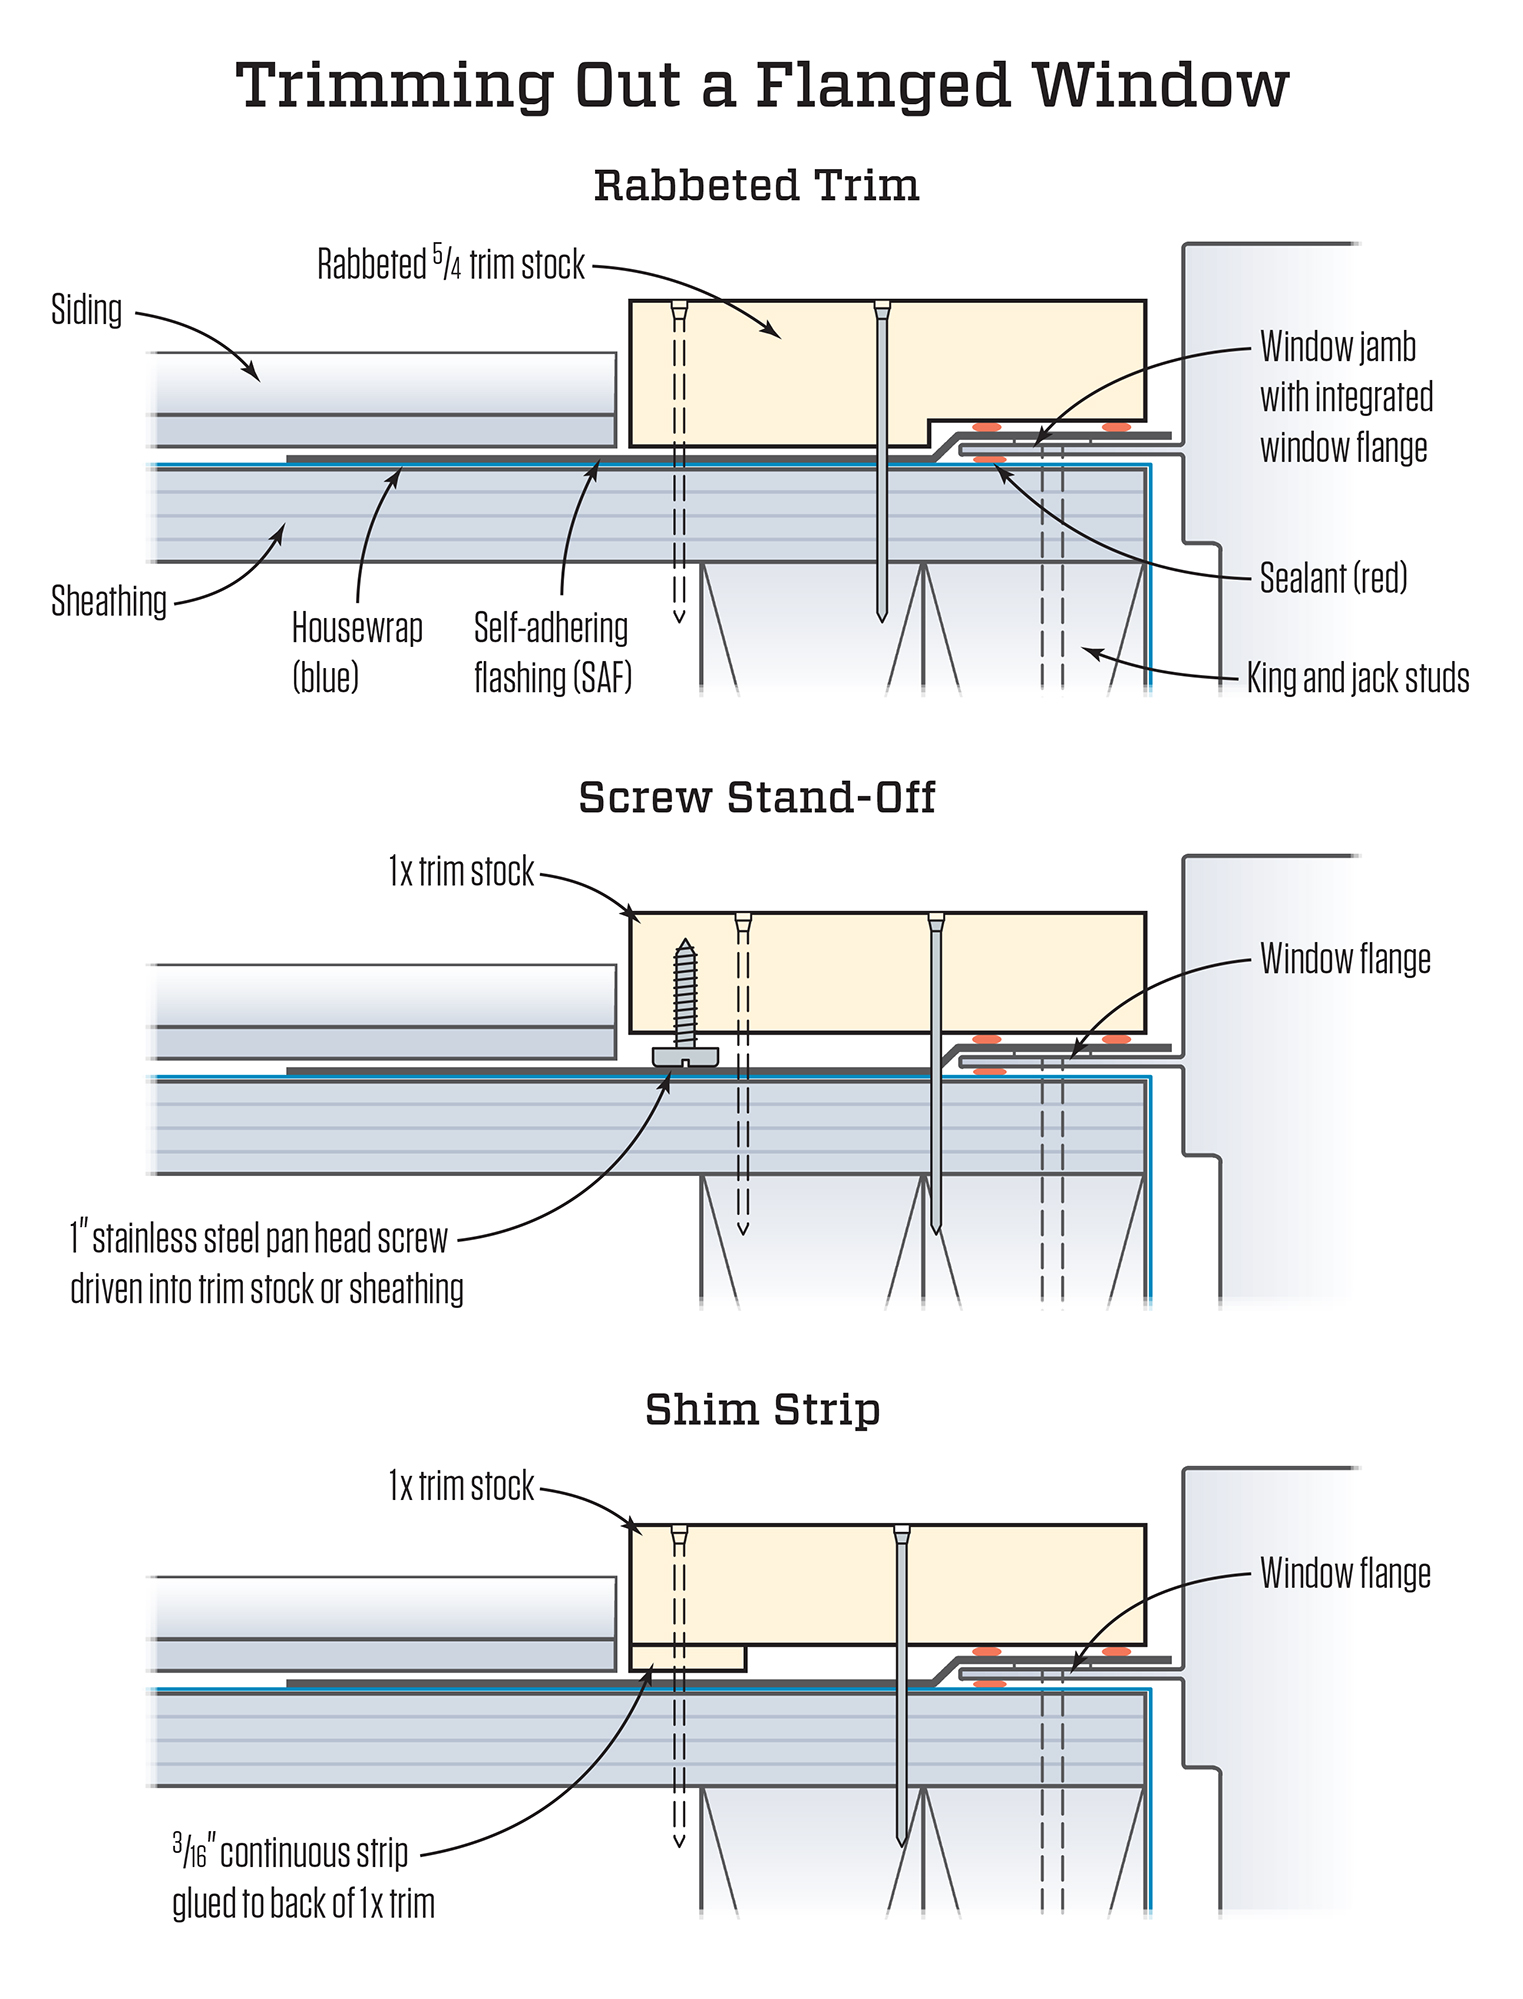 Installing Exterior Stock Trim Around a Flanged Window | JLC